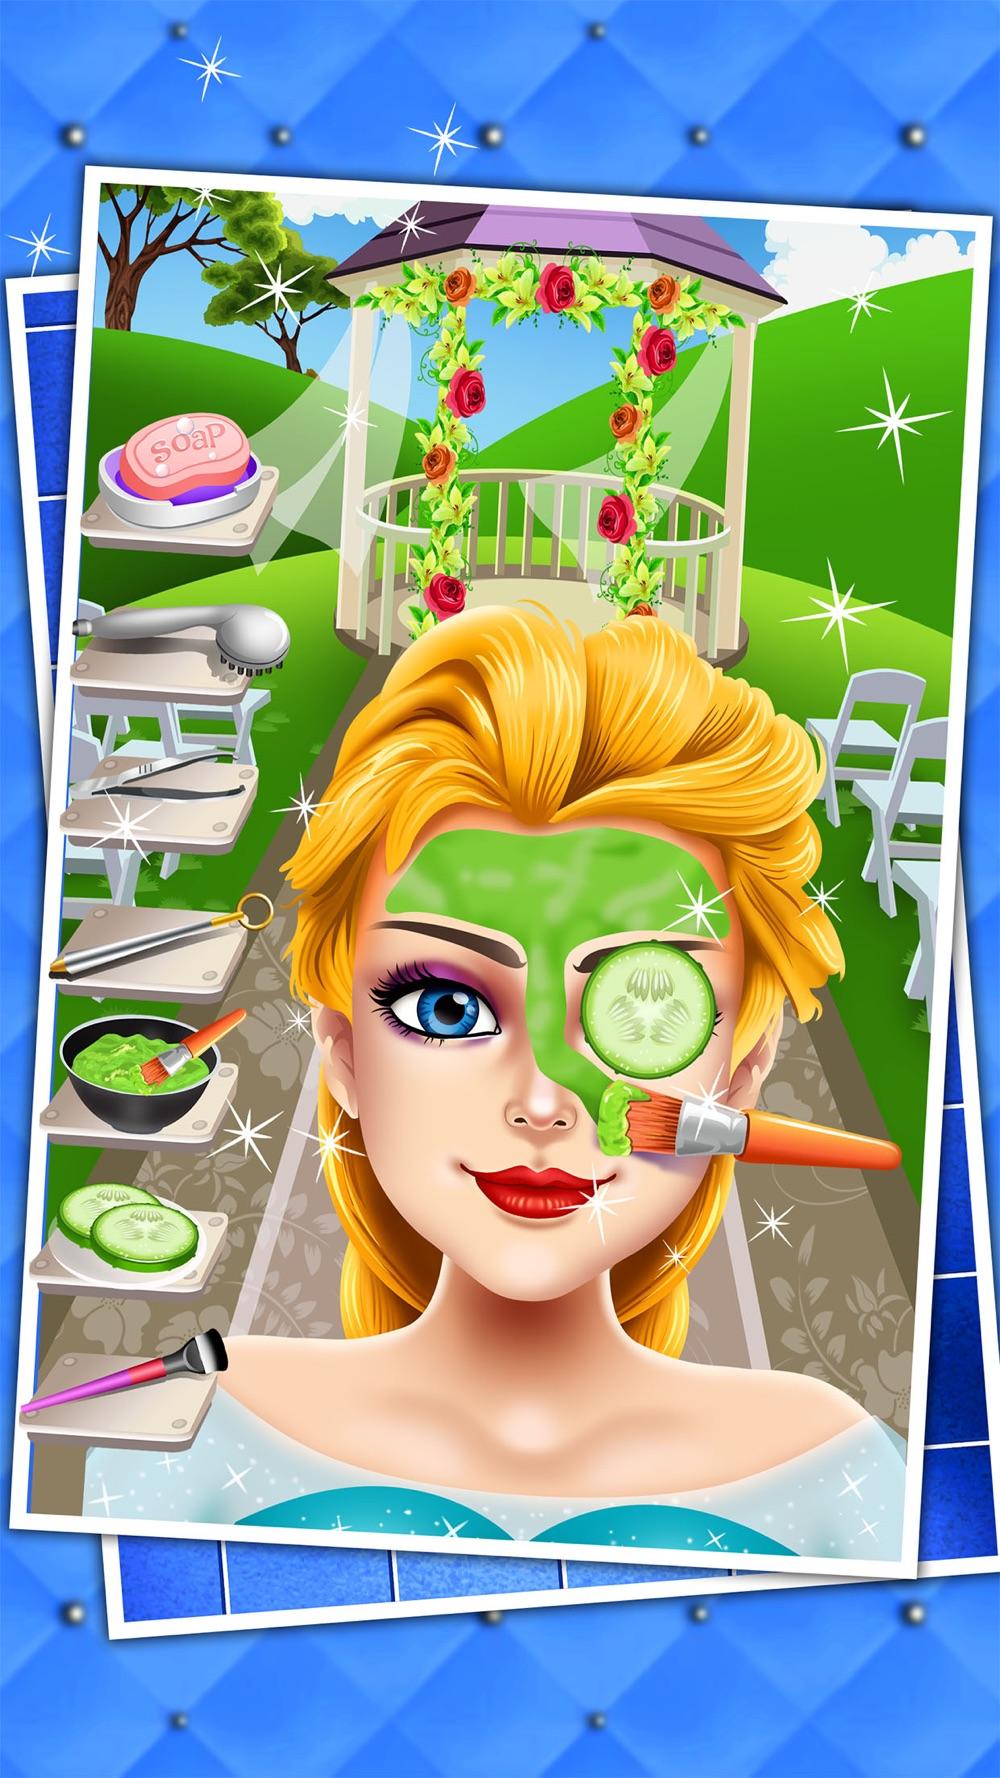 Princess Make-Up Salon & Spa Makeover Kids Games! Cheat Codes